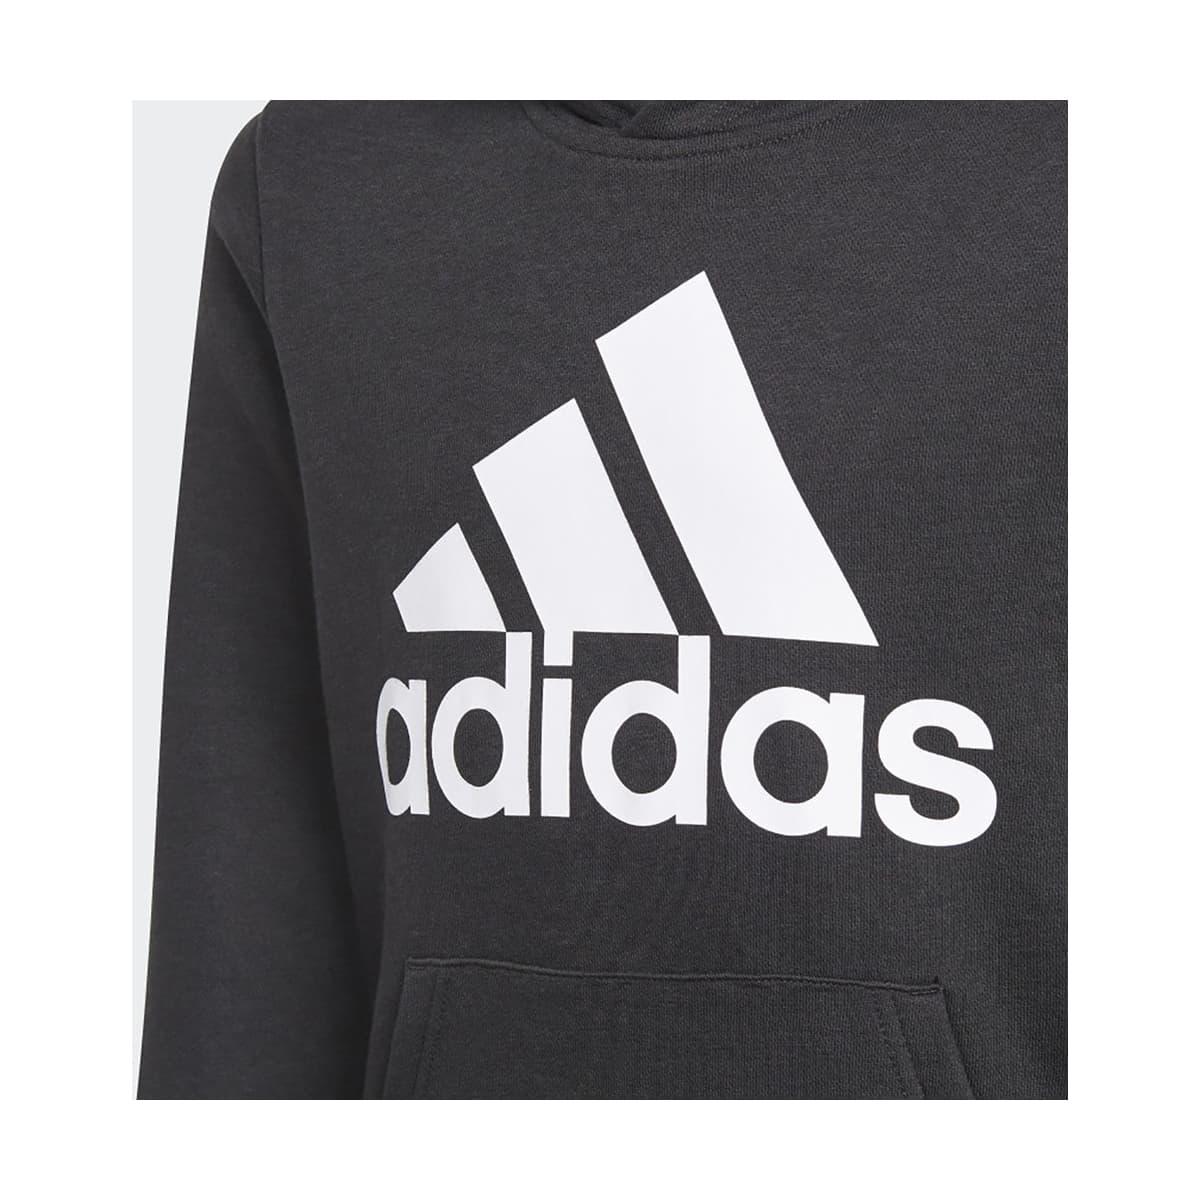 Essentials Kapüşonlu Çocuk Siyah Sweatshirt (GN4027)